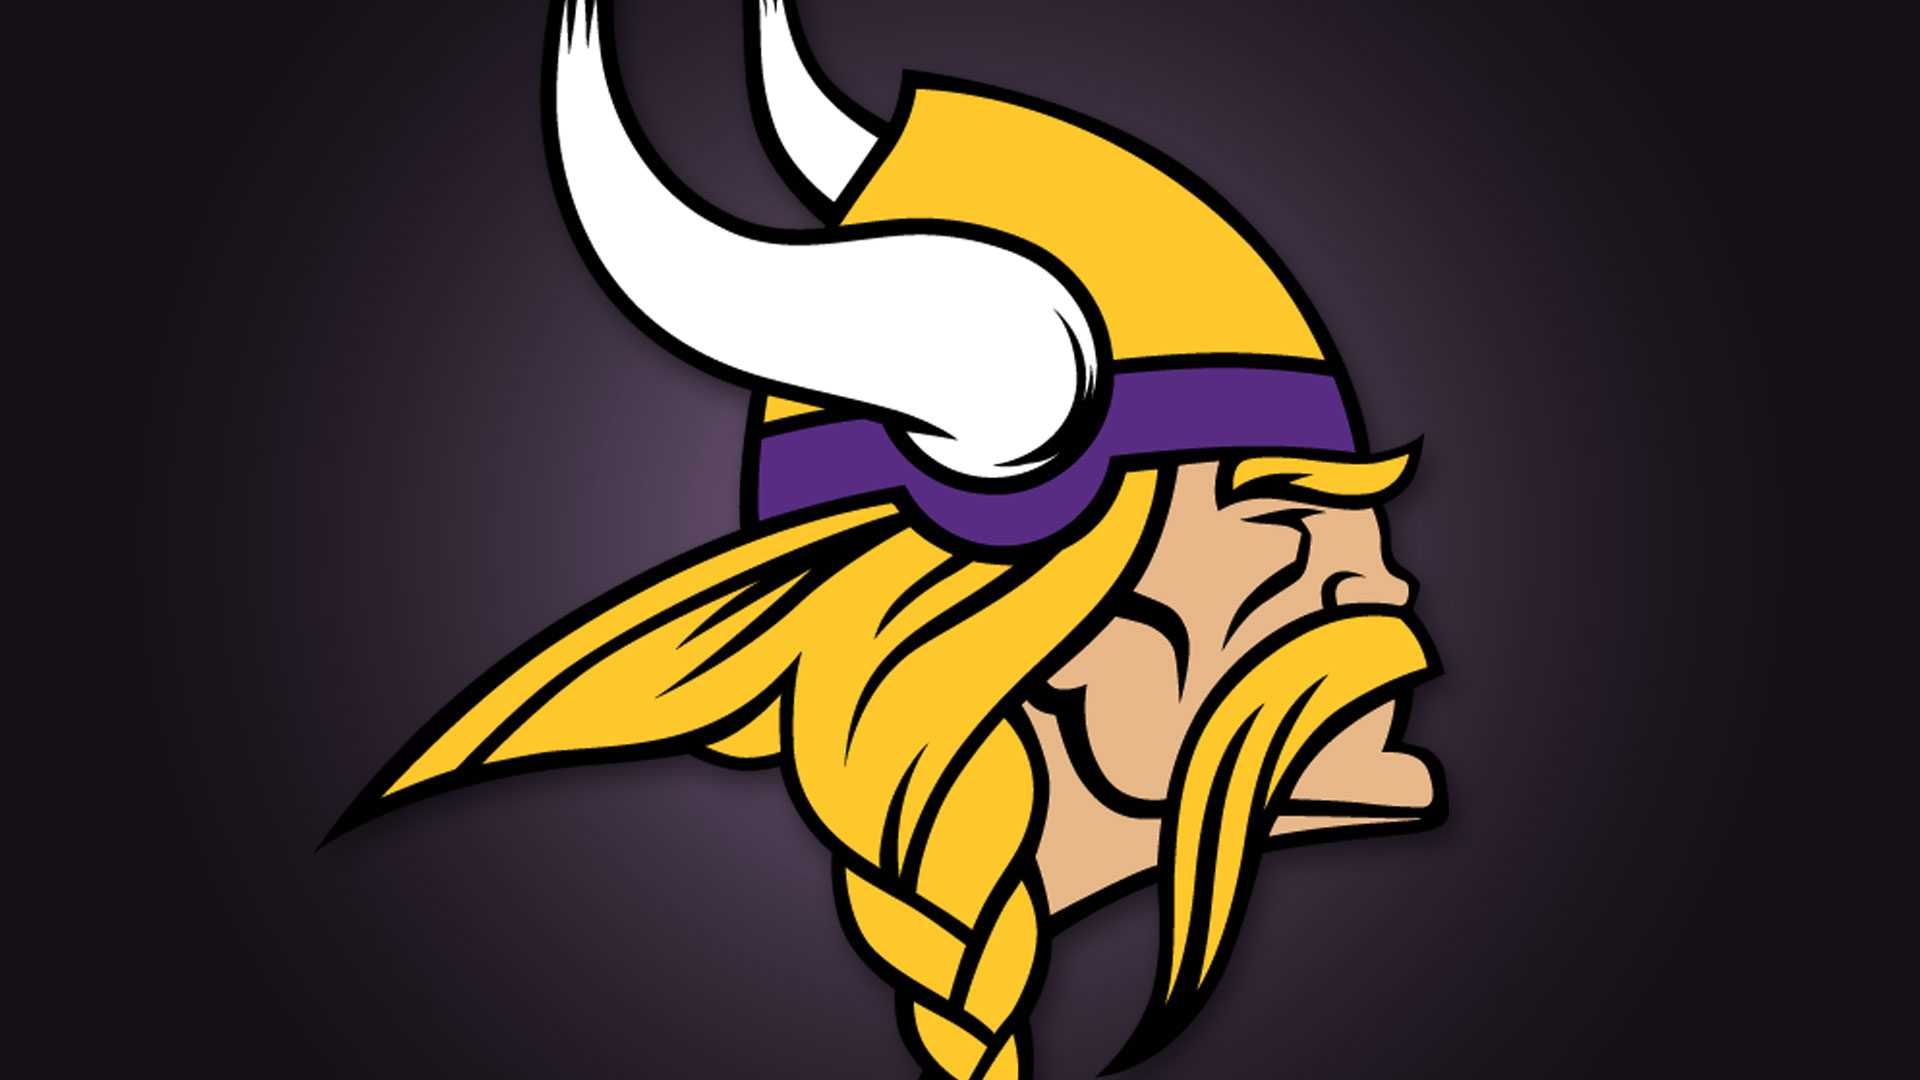 Minnesota Vikings wallpaper picture